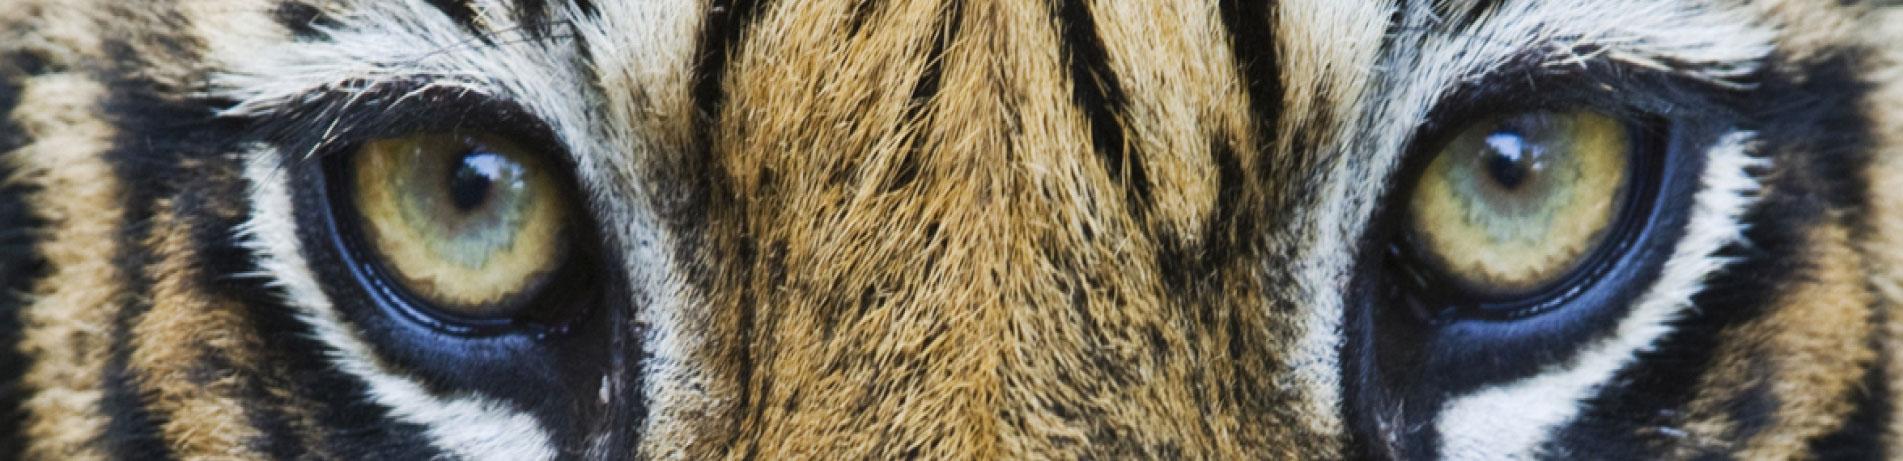 Close up image of tiger eyes